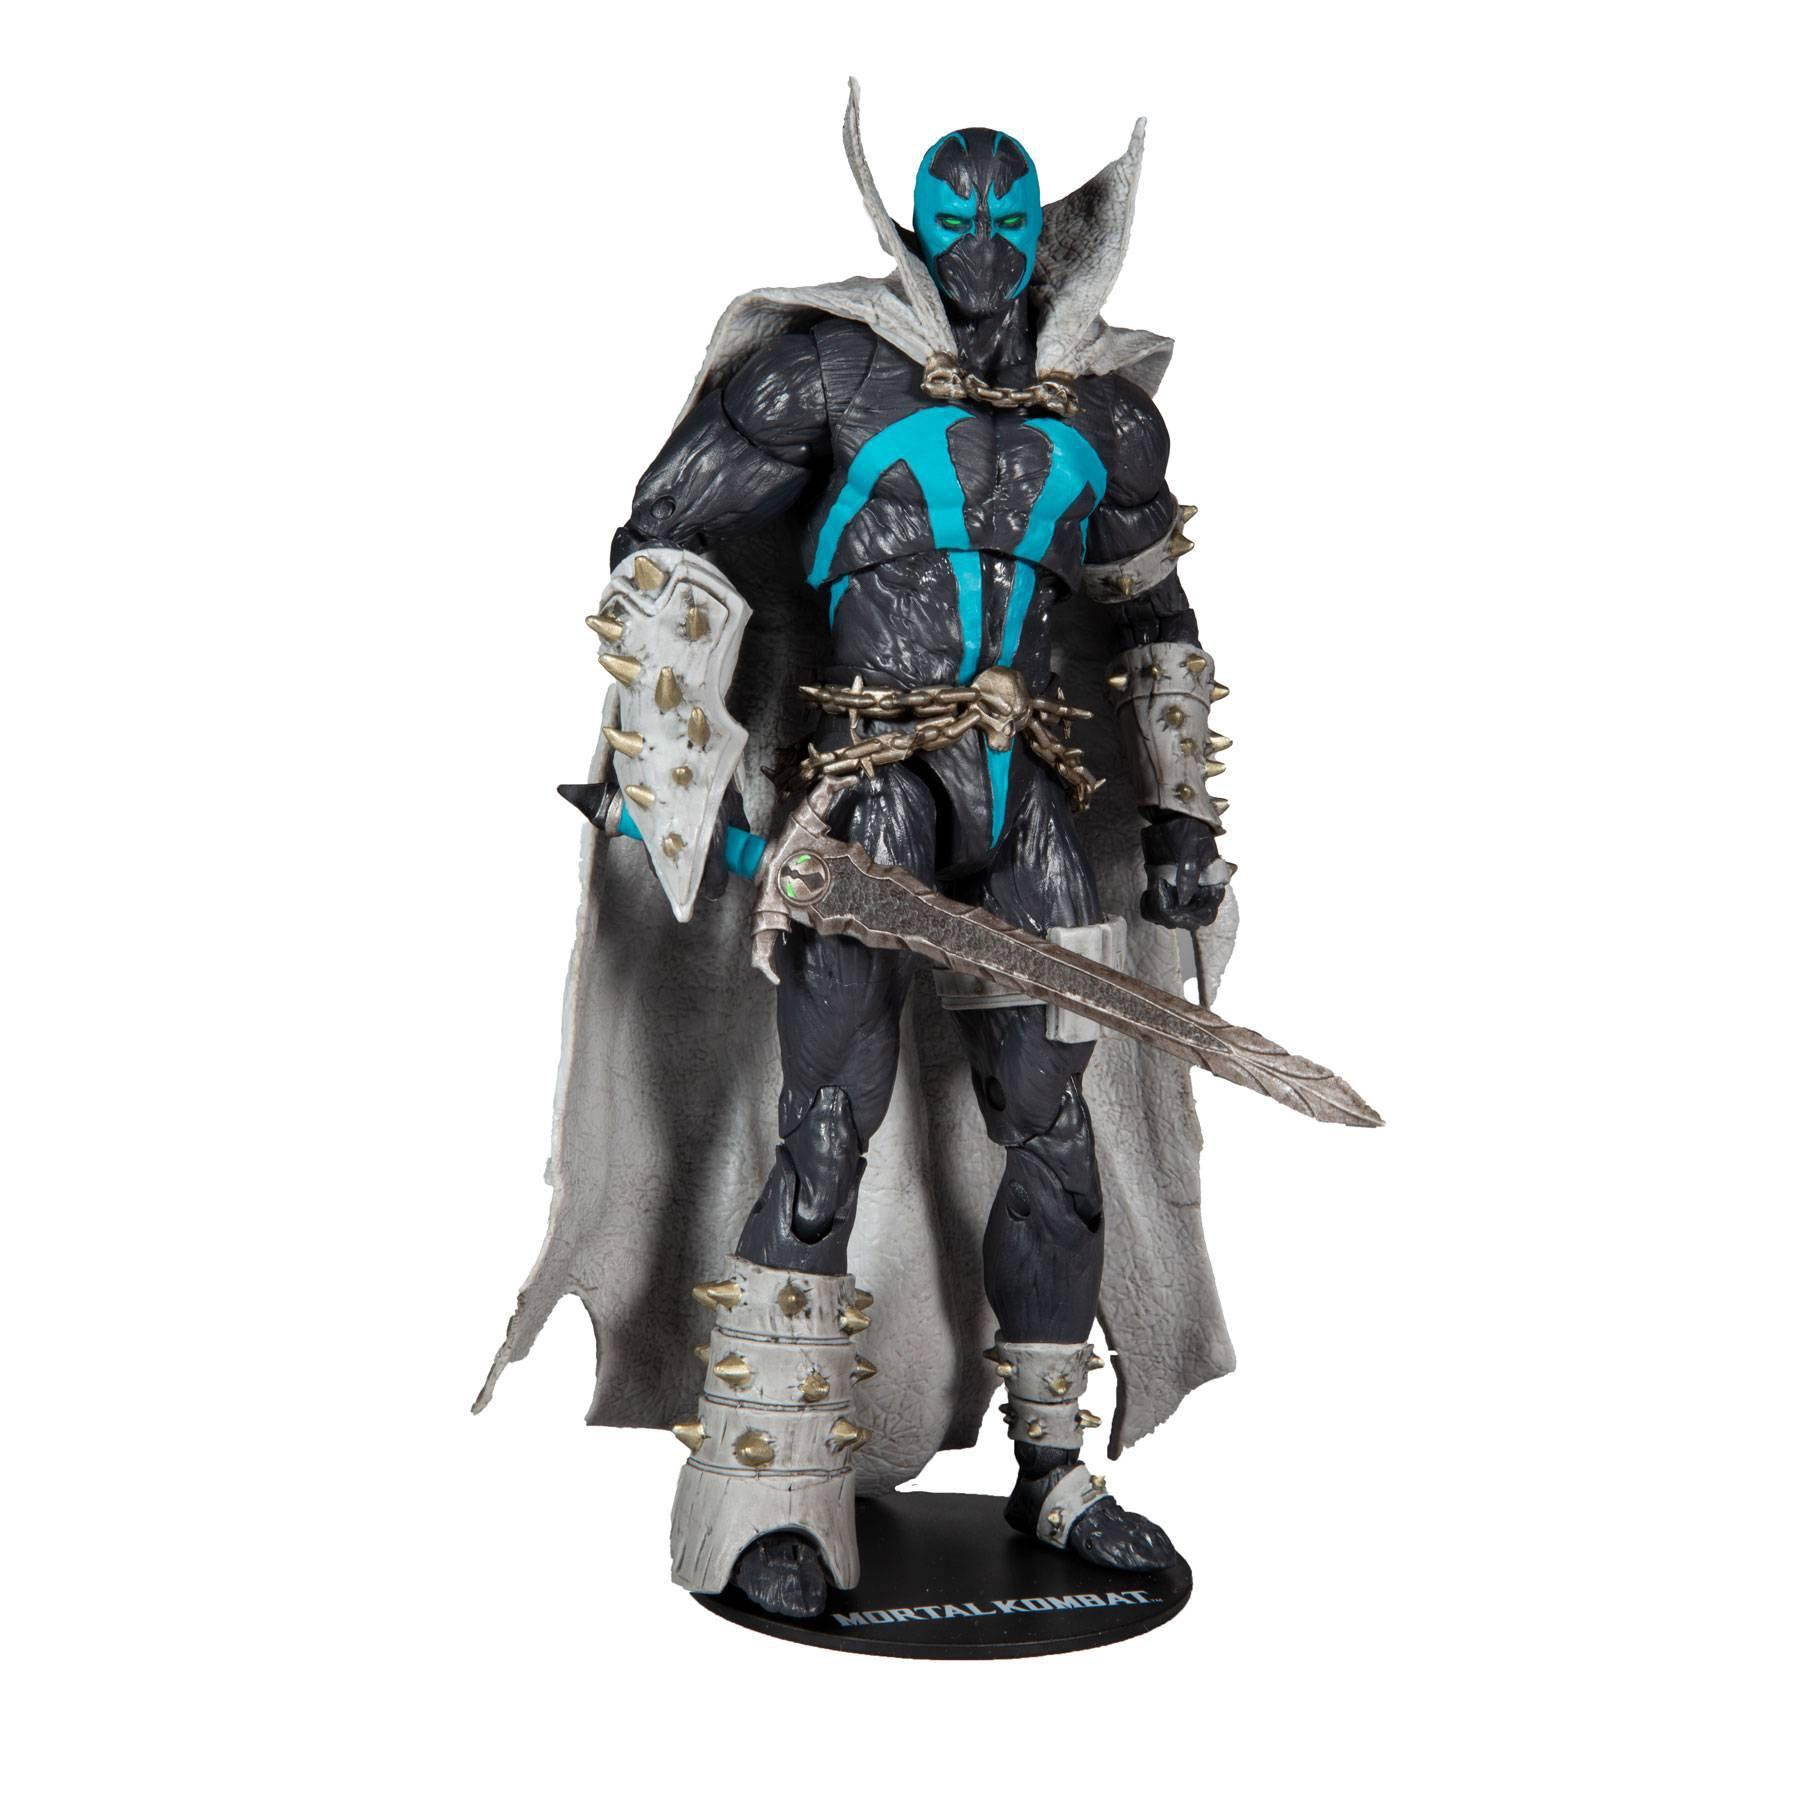 Mortal Kombat Actionfigur Spawn (Lord Covenant) 18 cm MCF11041 787926110418